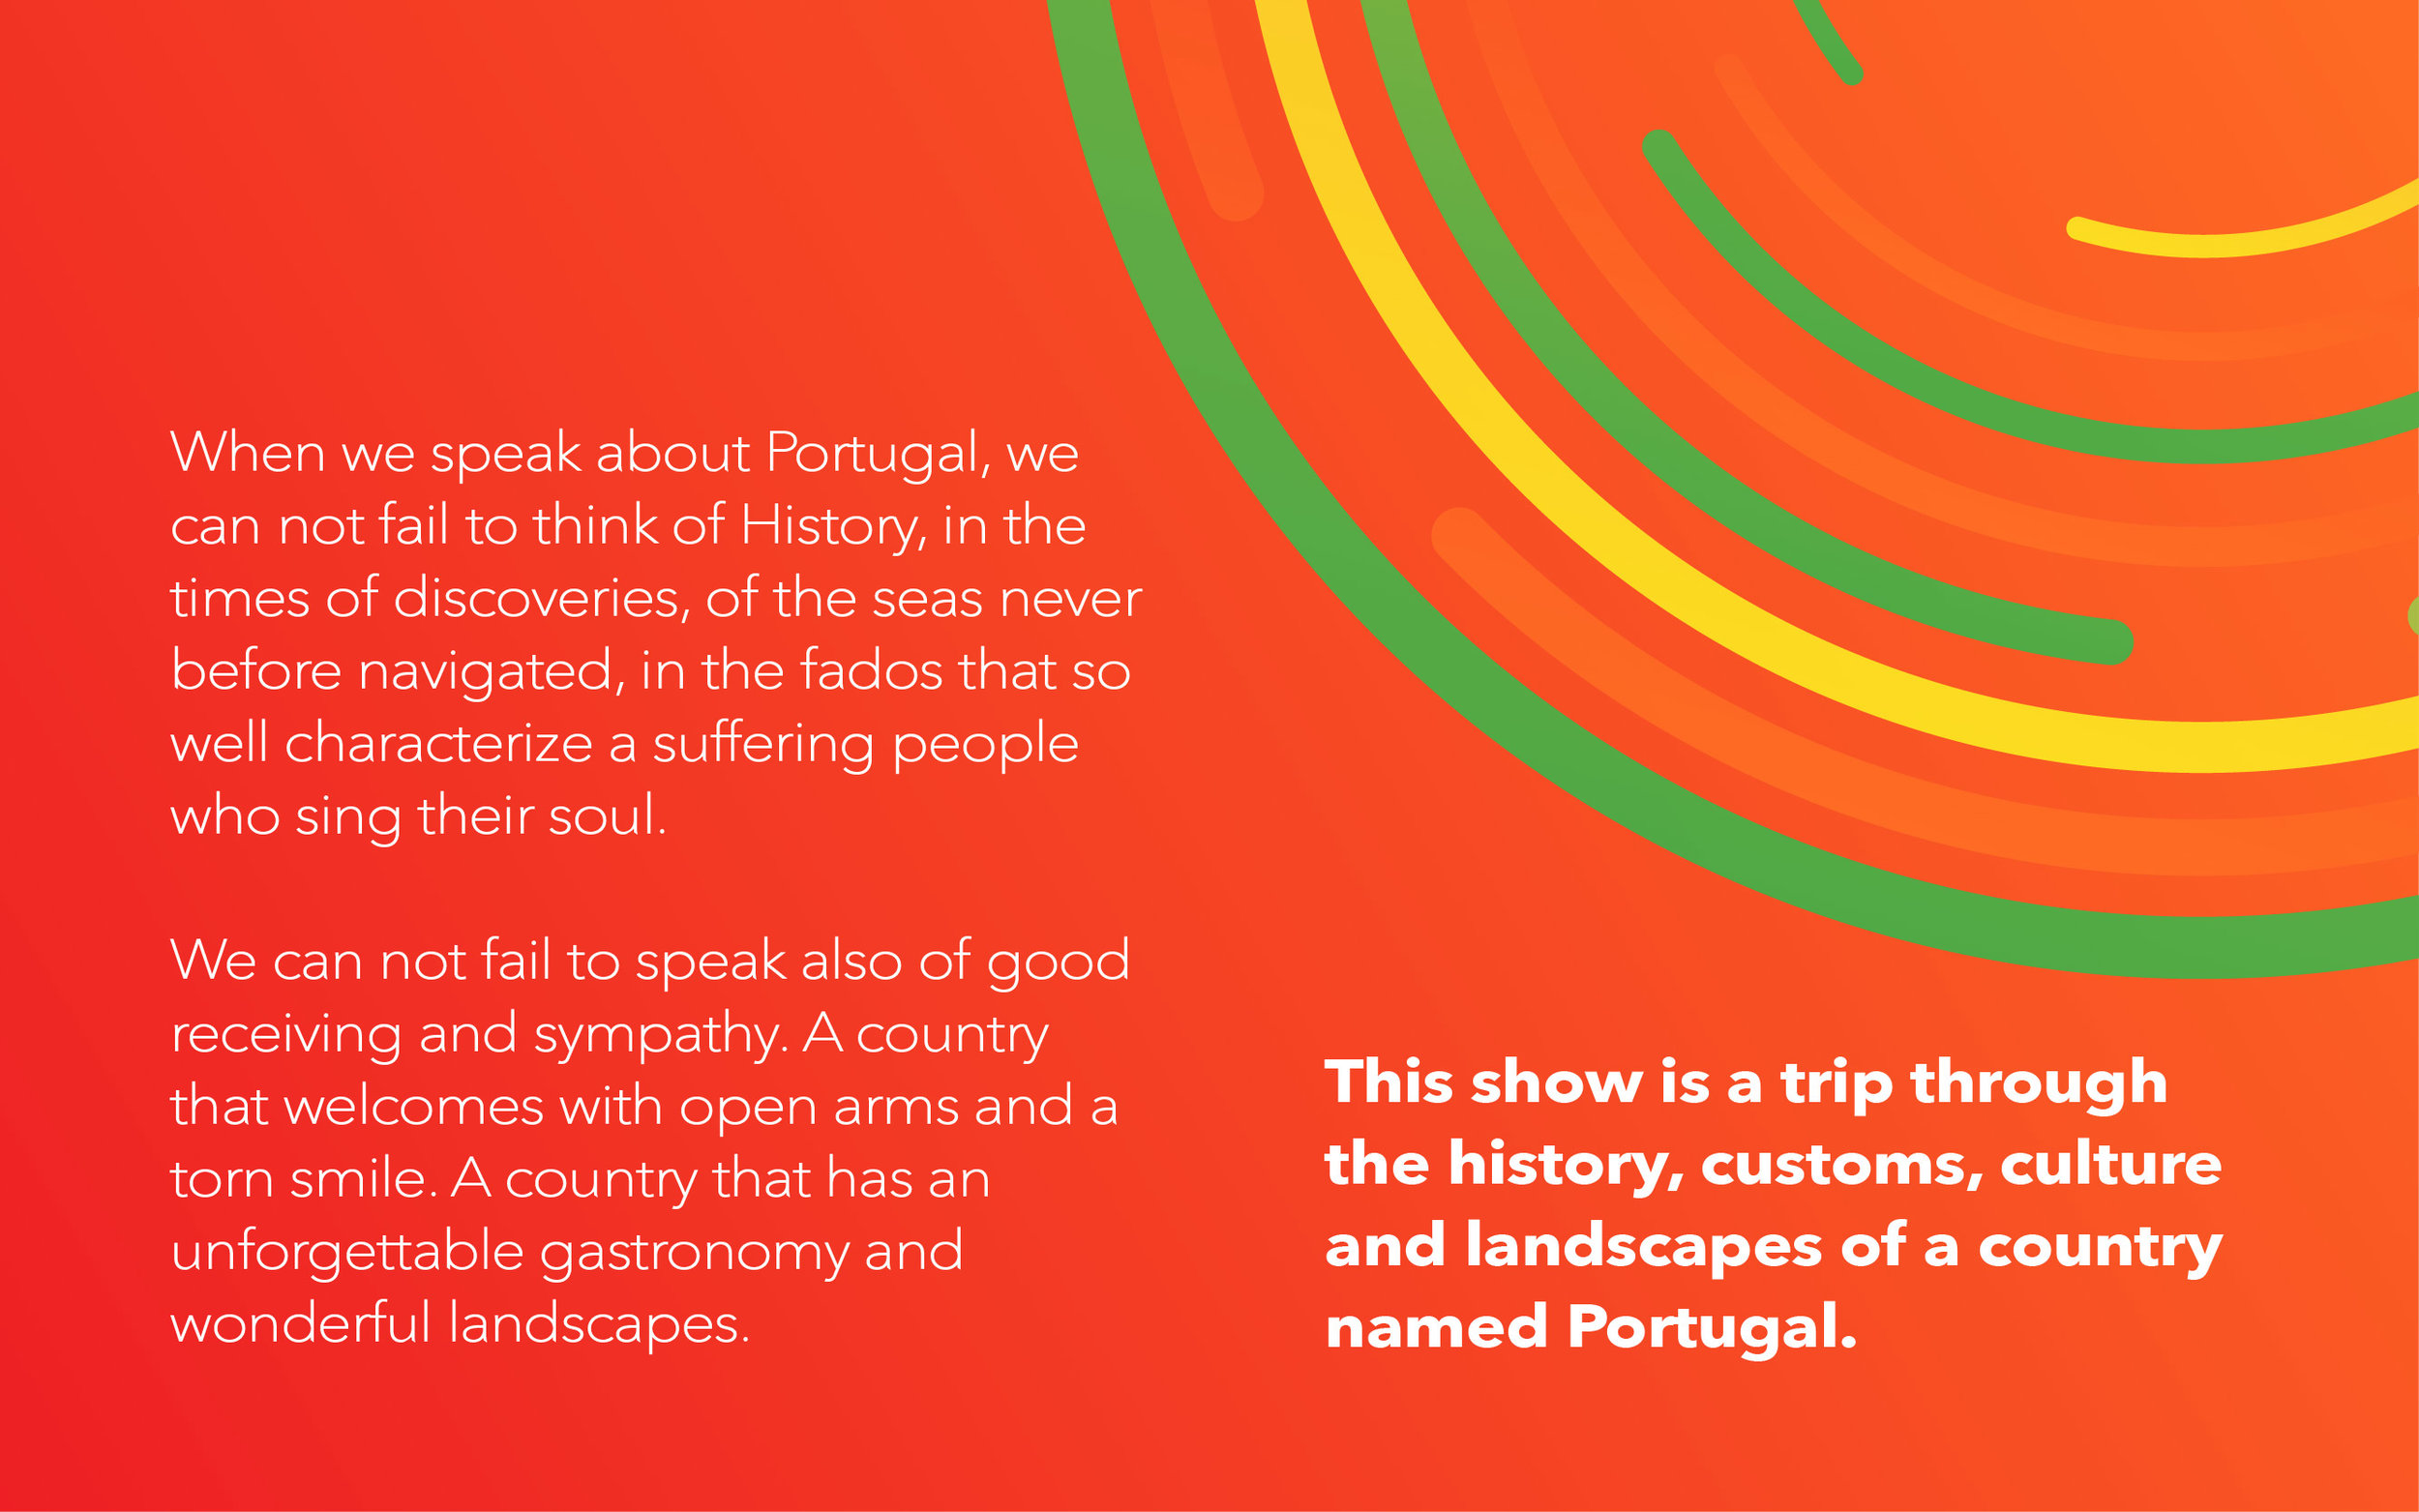 Cultura portuguesa_AP_vf1-06.jpg